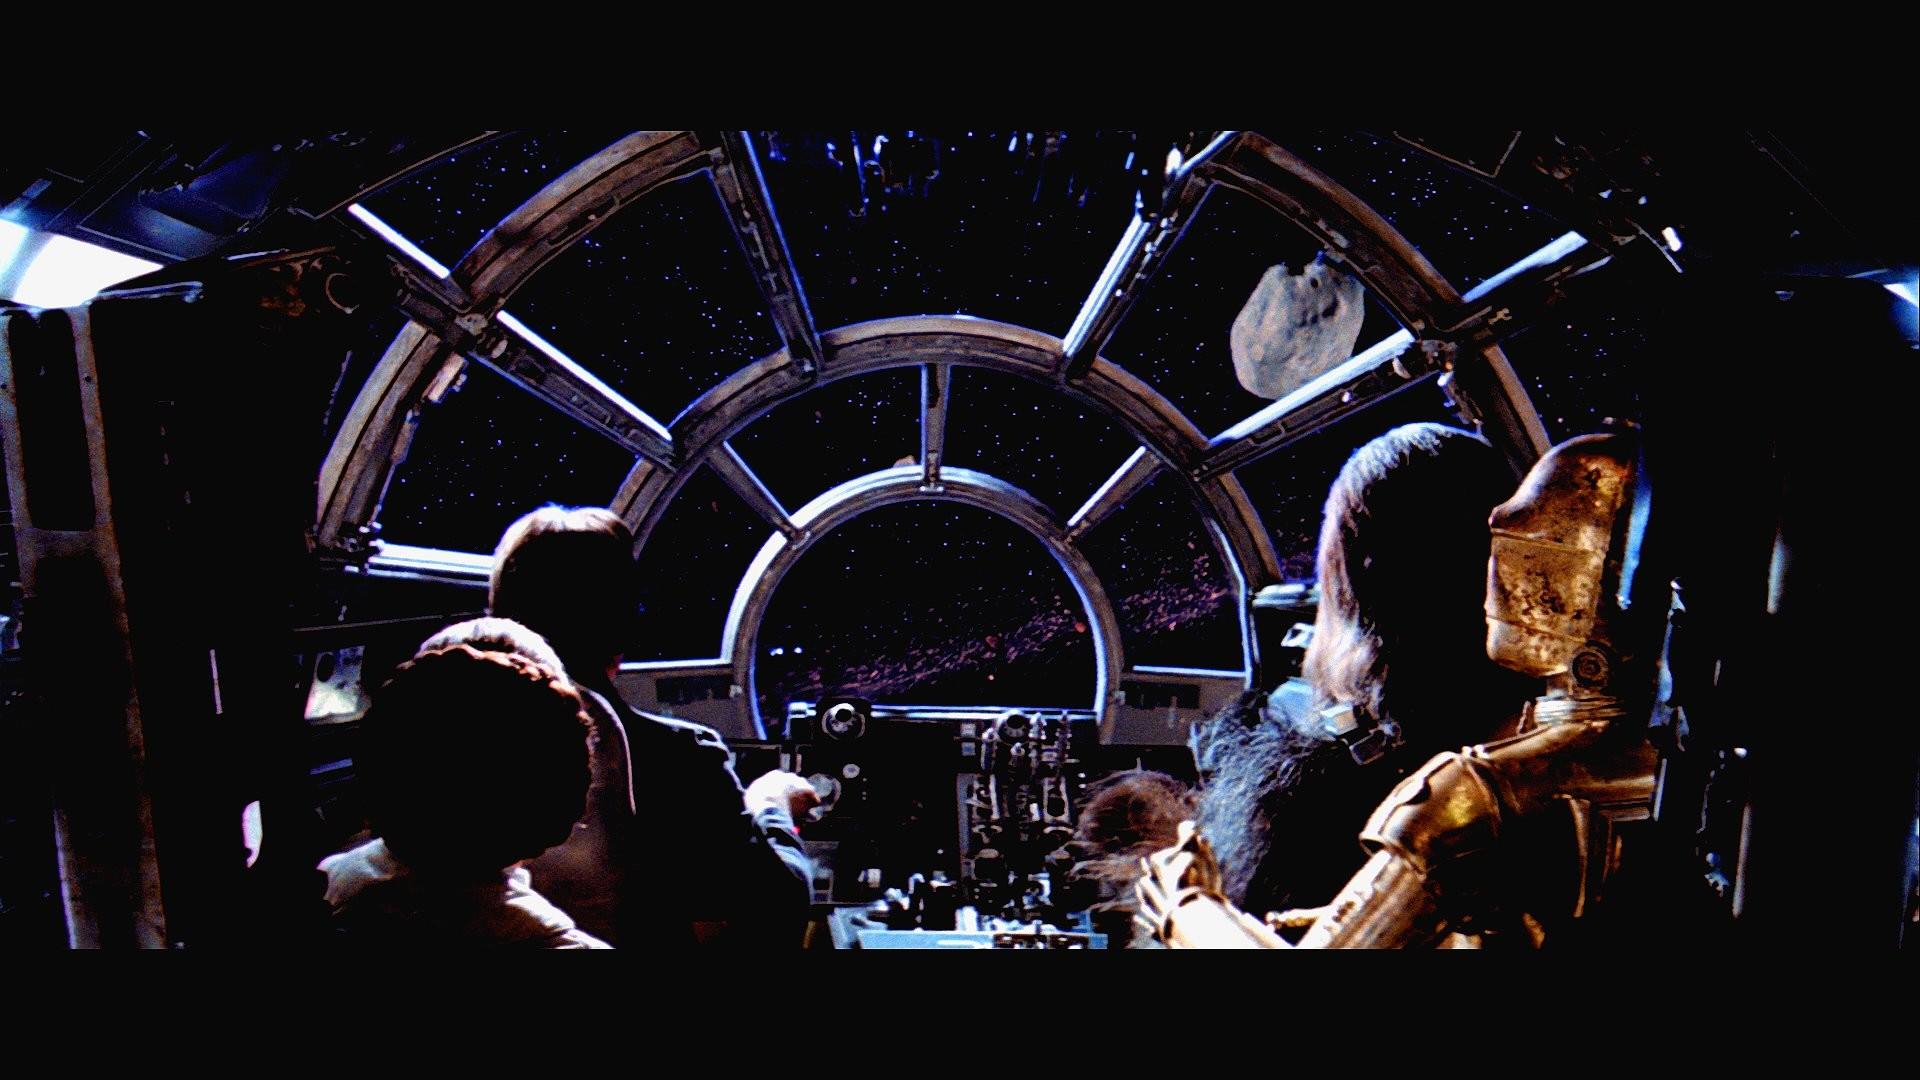 STAR WARS EMPIRE STRIKES BACK sci-fi futuristic movie film action (7)  wallpaper     256340   WallpaperUP